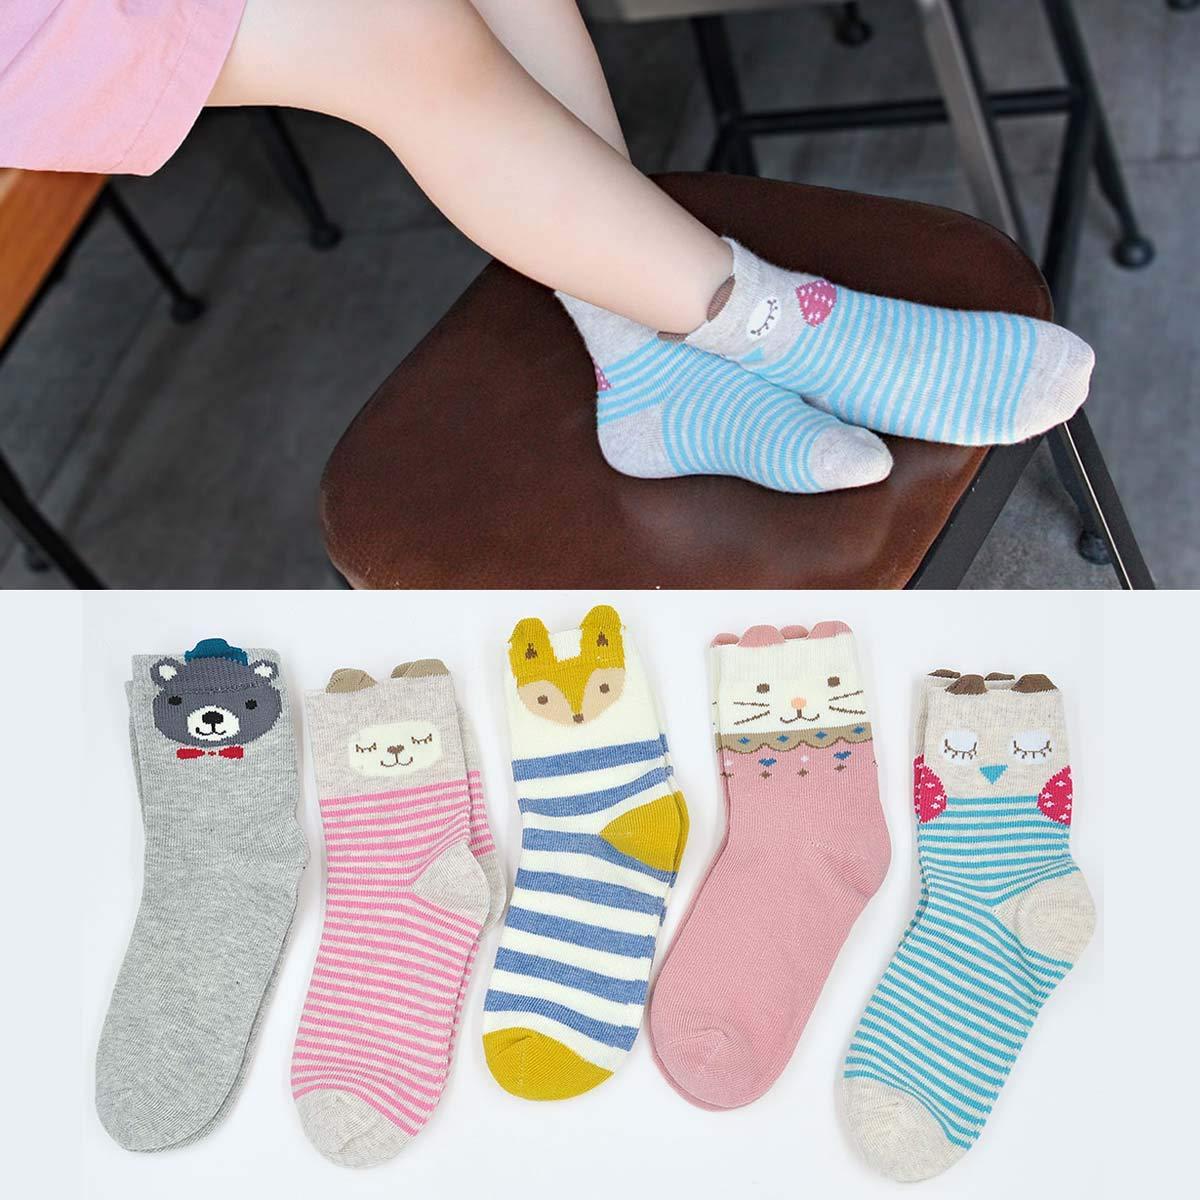 Kids Cotton Crew Socks Toddler Boys Girls Anti-slip Novelty Cute Cat Animal Socks 5 Pairs